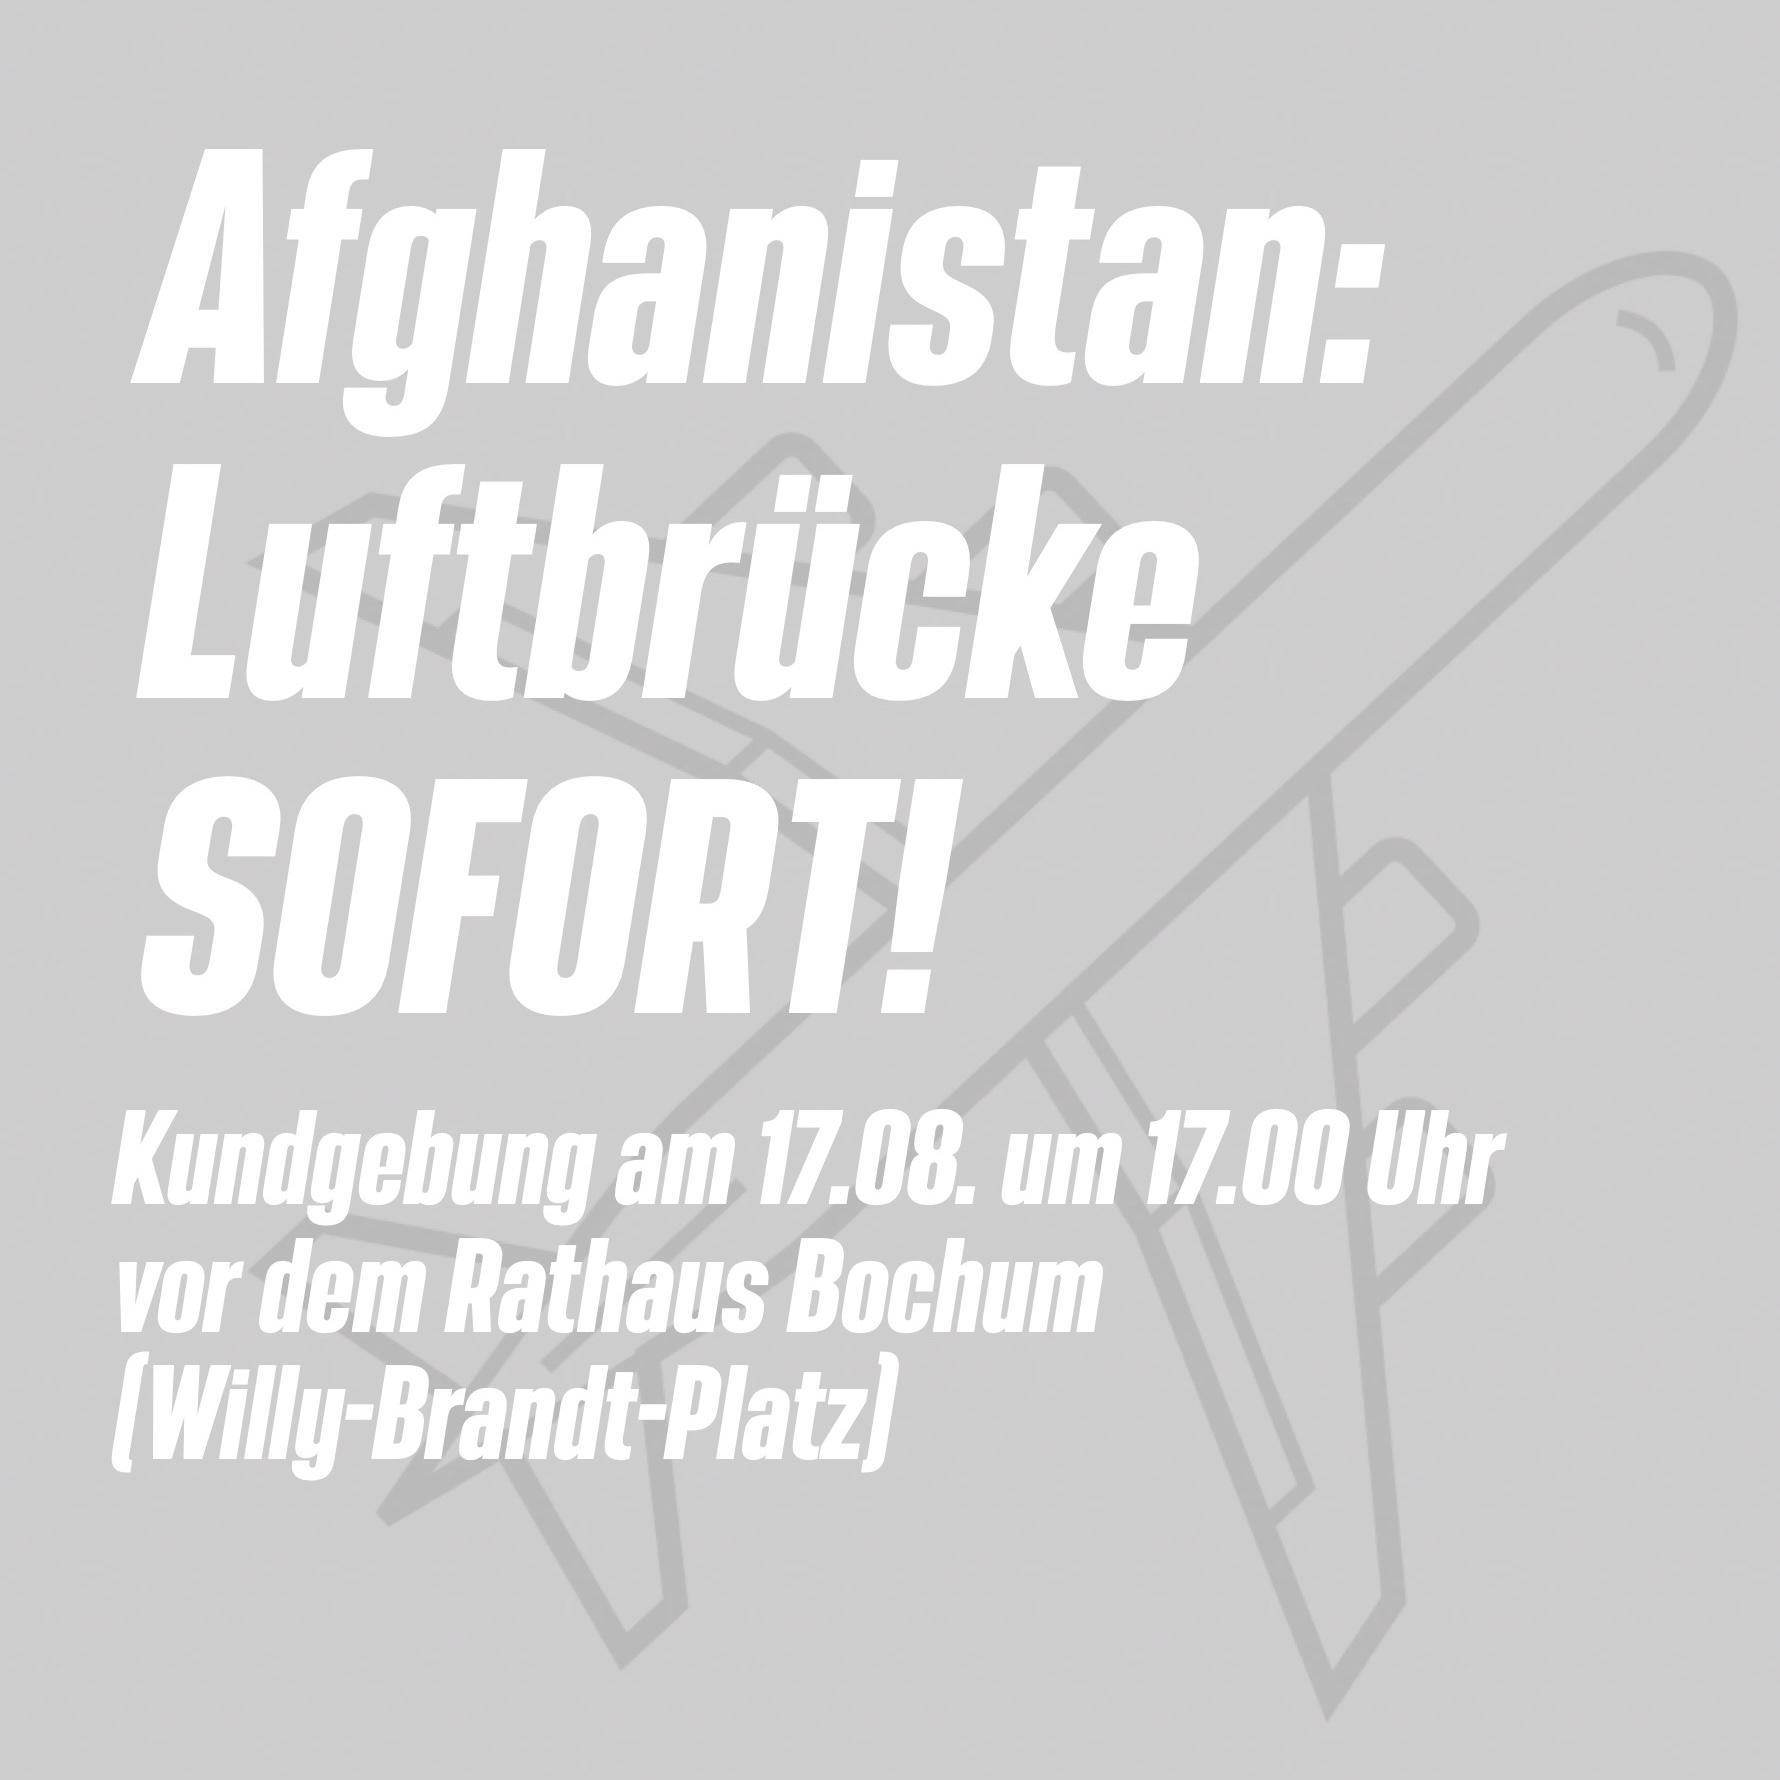 Afghanistan-luftbrücke-sofort-kundgebung-verantaltung-rathaus-bochum-grüne-fraktion